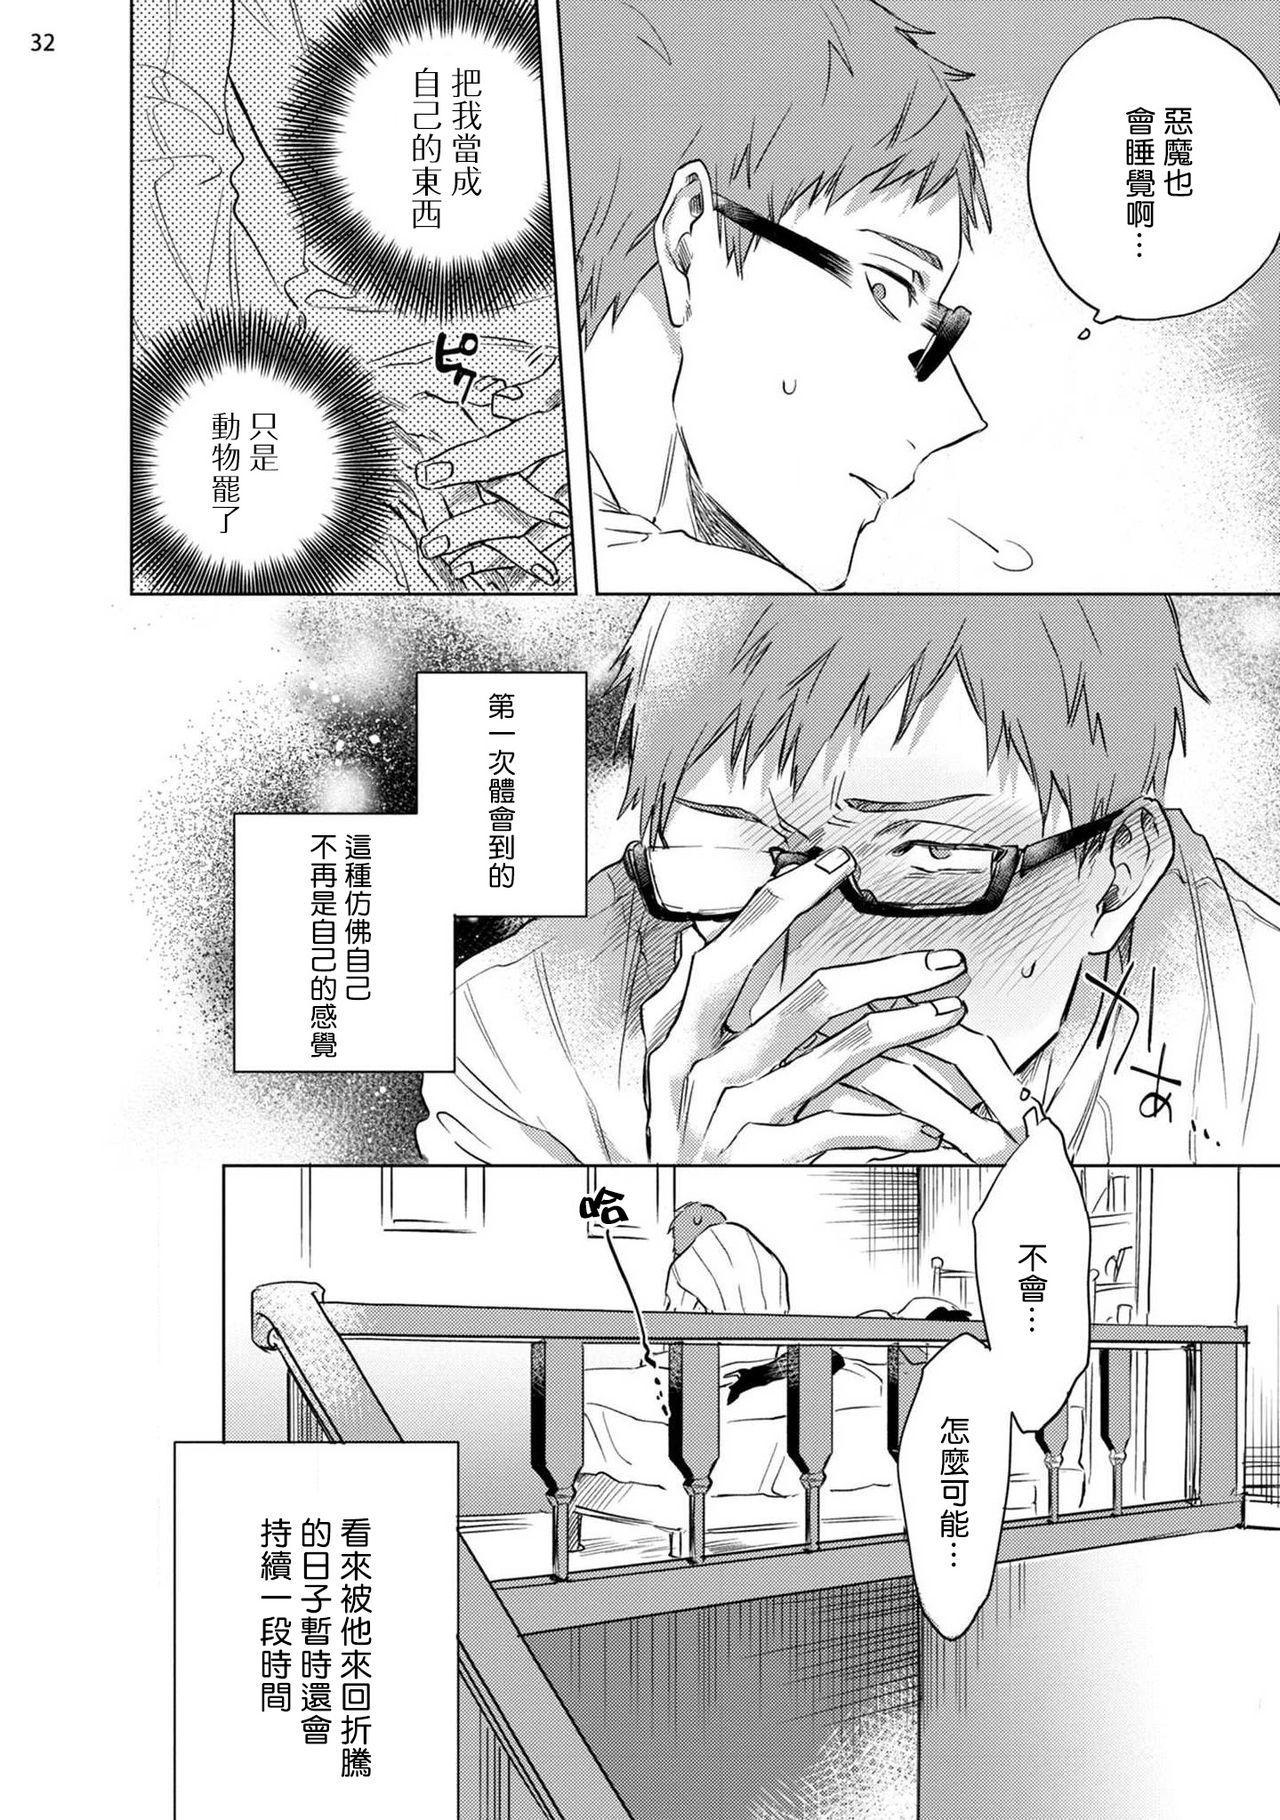 [Yao] Inma-sama ni Hallelujah!   赞美淫魔大人! Ch. 1-3 [Chinese] [拾荒者汉化组] [Digital] 68